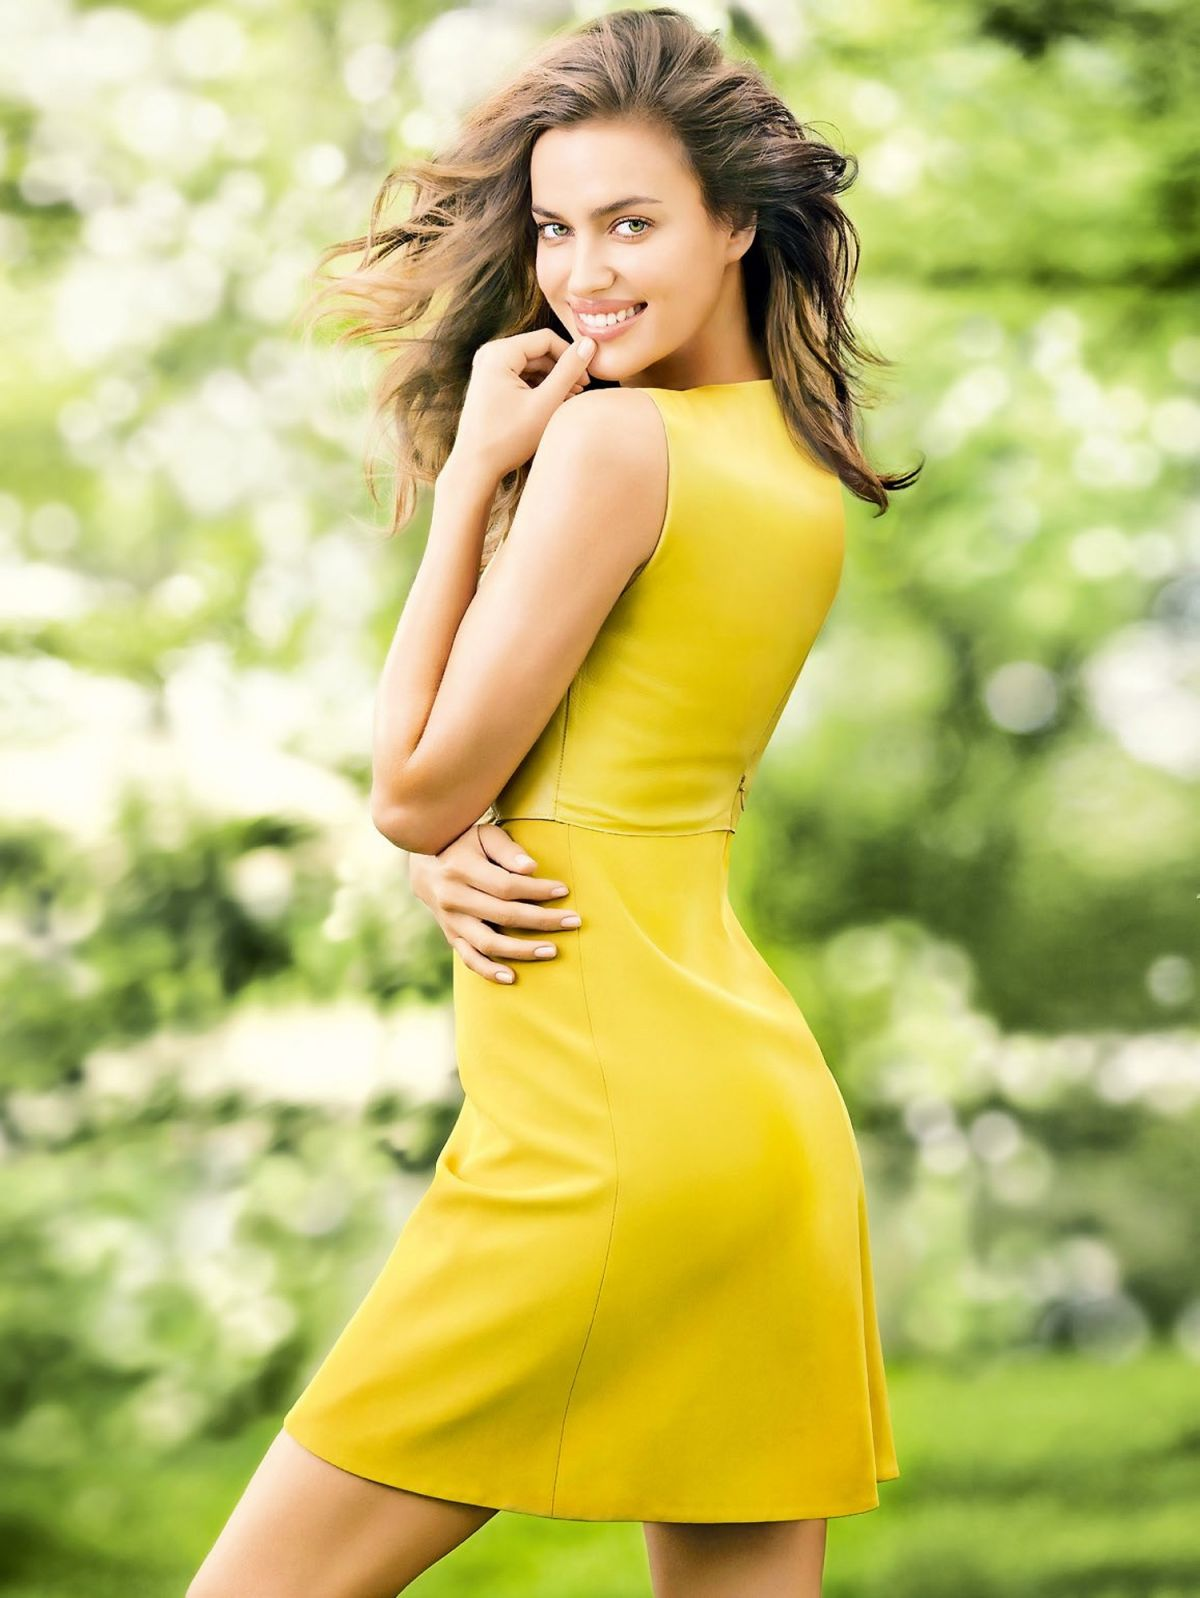 IRINA SHAYK - Cosmopolitan Magazine Photoshoot - HawtCelebs ...